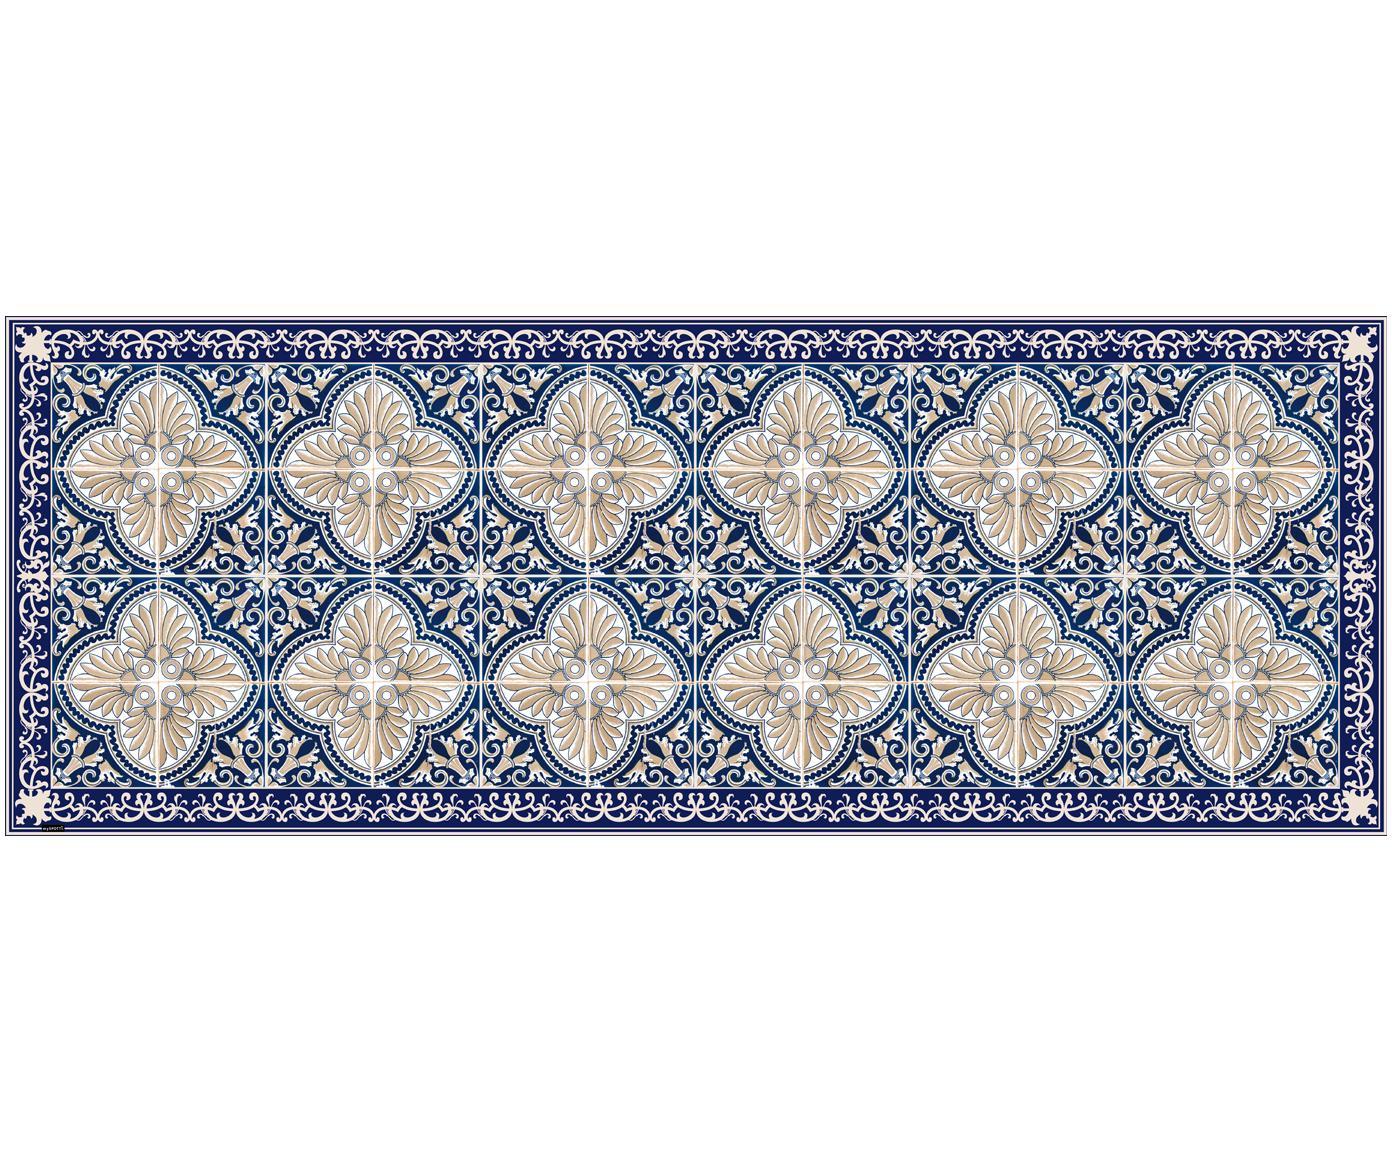 Alfombra vinílica Luis, Vinilo, reciclable, Azul oscuro, beige, An 68 x L 180 cm